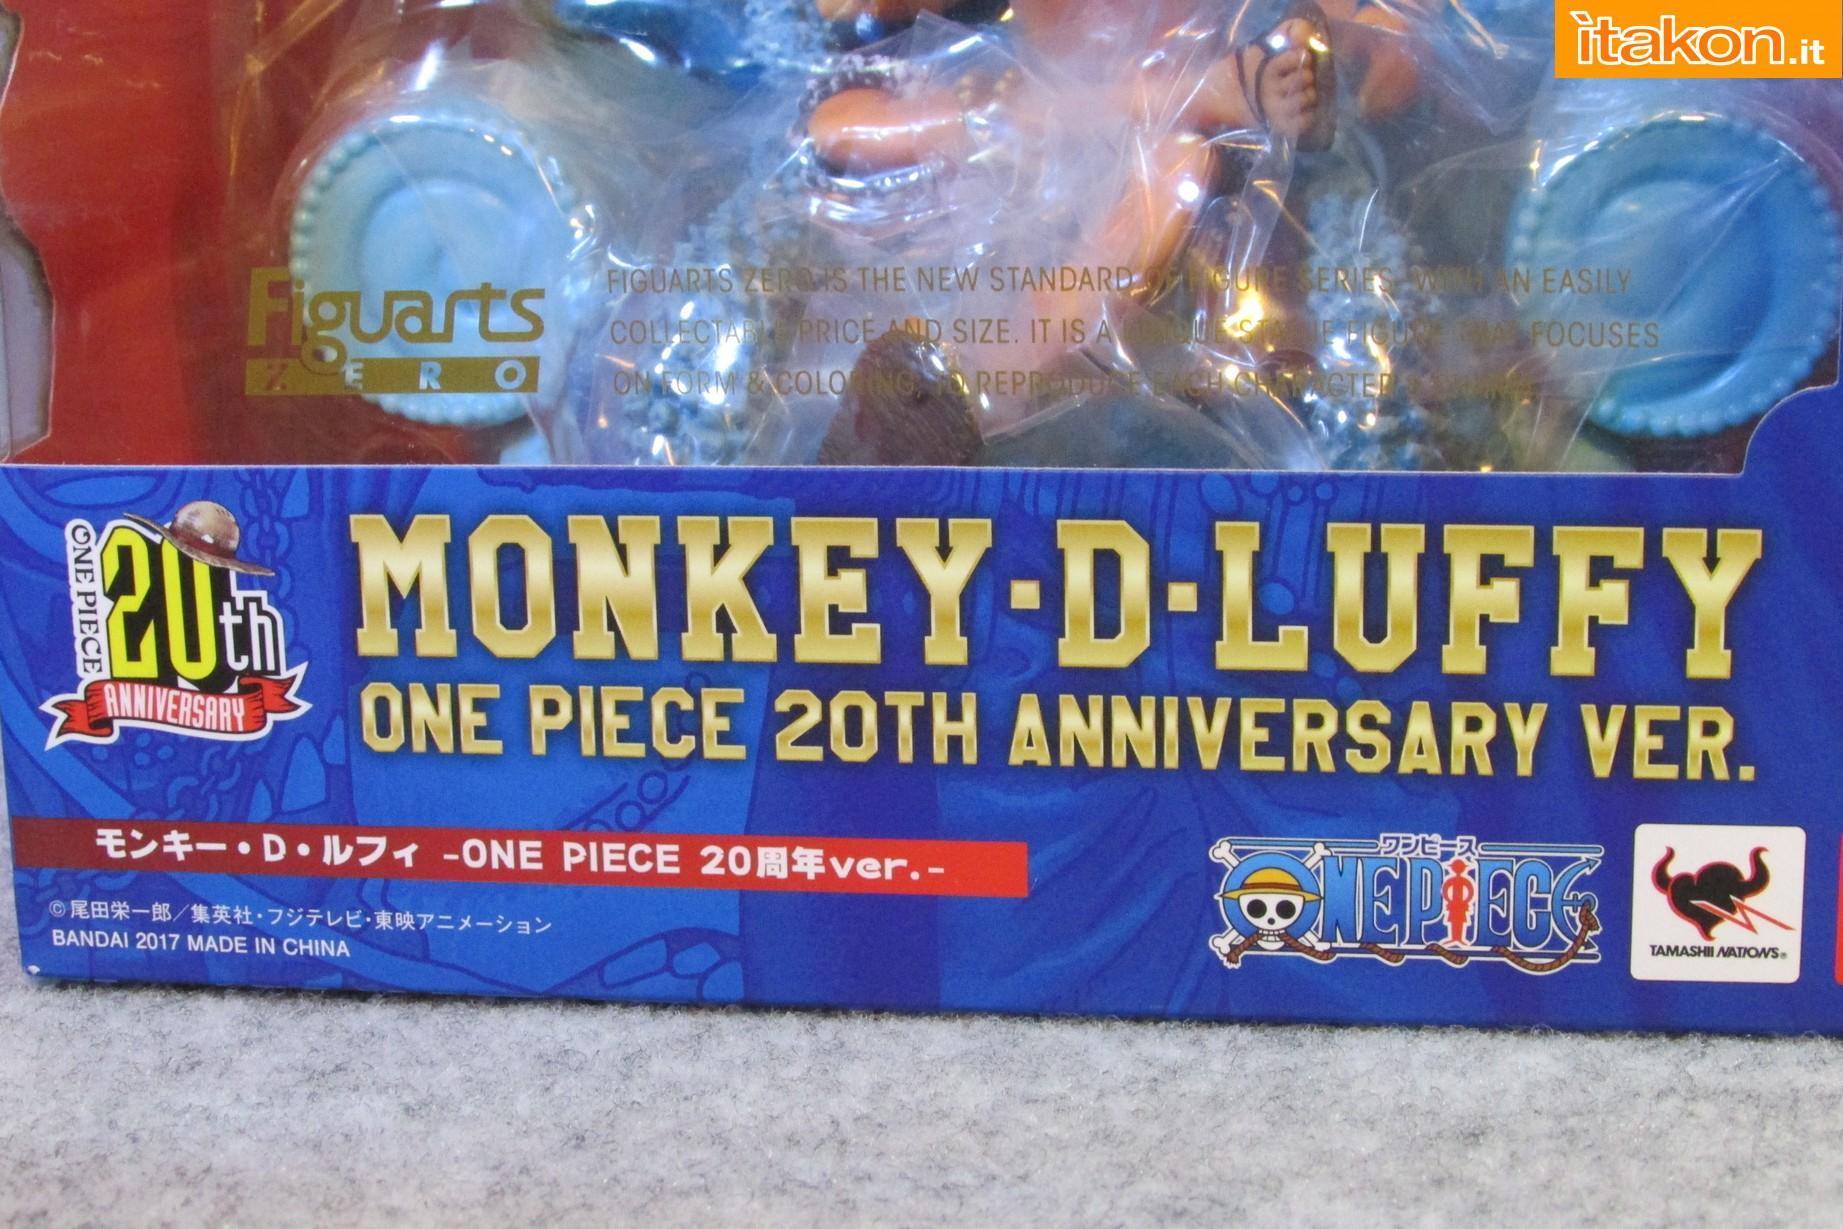 Link a Recensione Review Monkey D. Luffy One Piece 20th Anniversary ver. Figuarts ZERO di Bandai 07